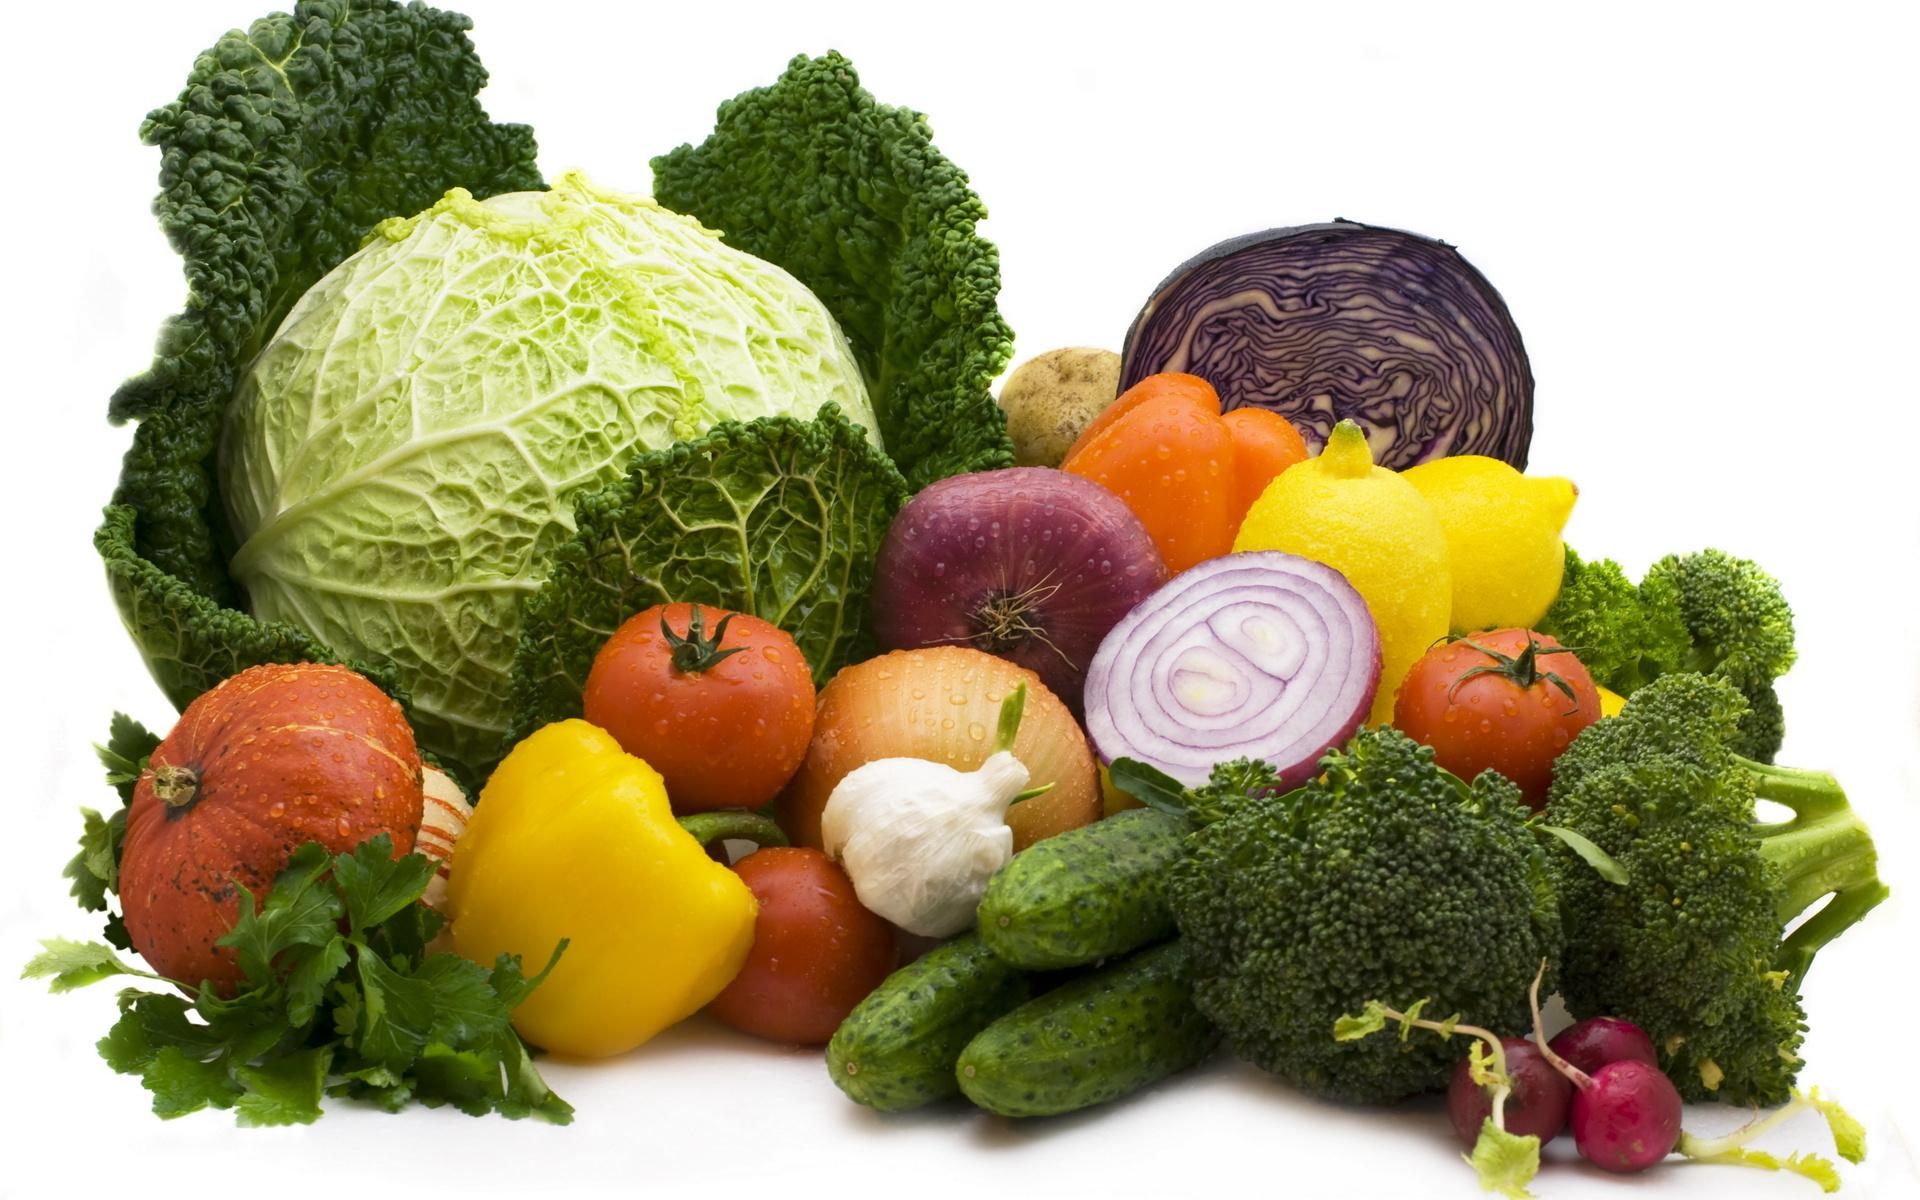 Food   Vegetables Vegetable Tomato Wallpaper 1920x1200